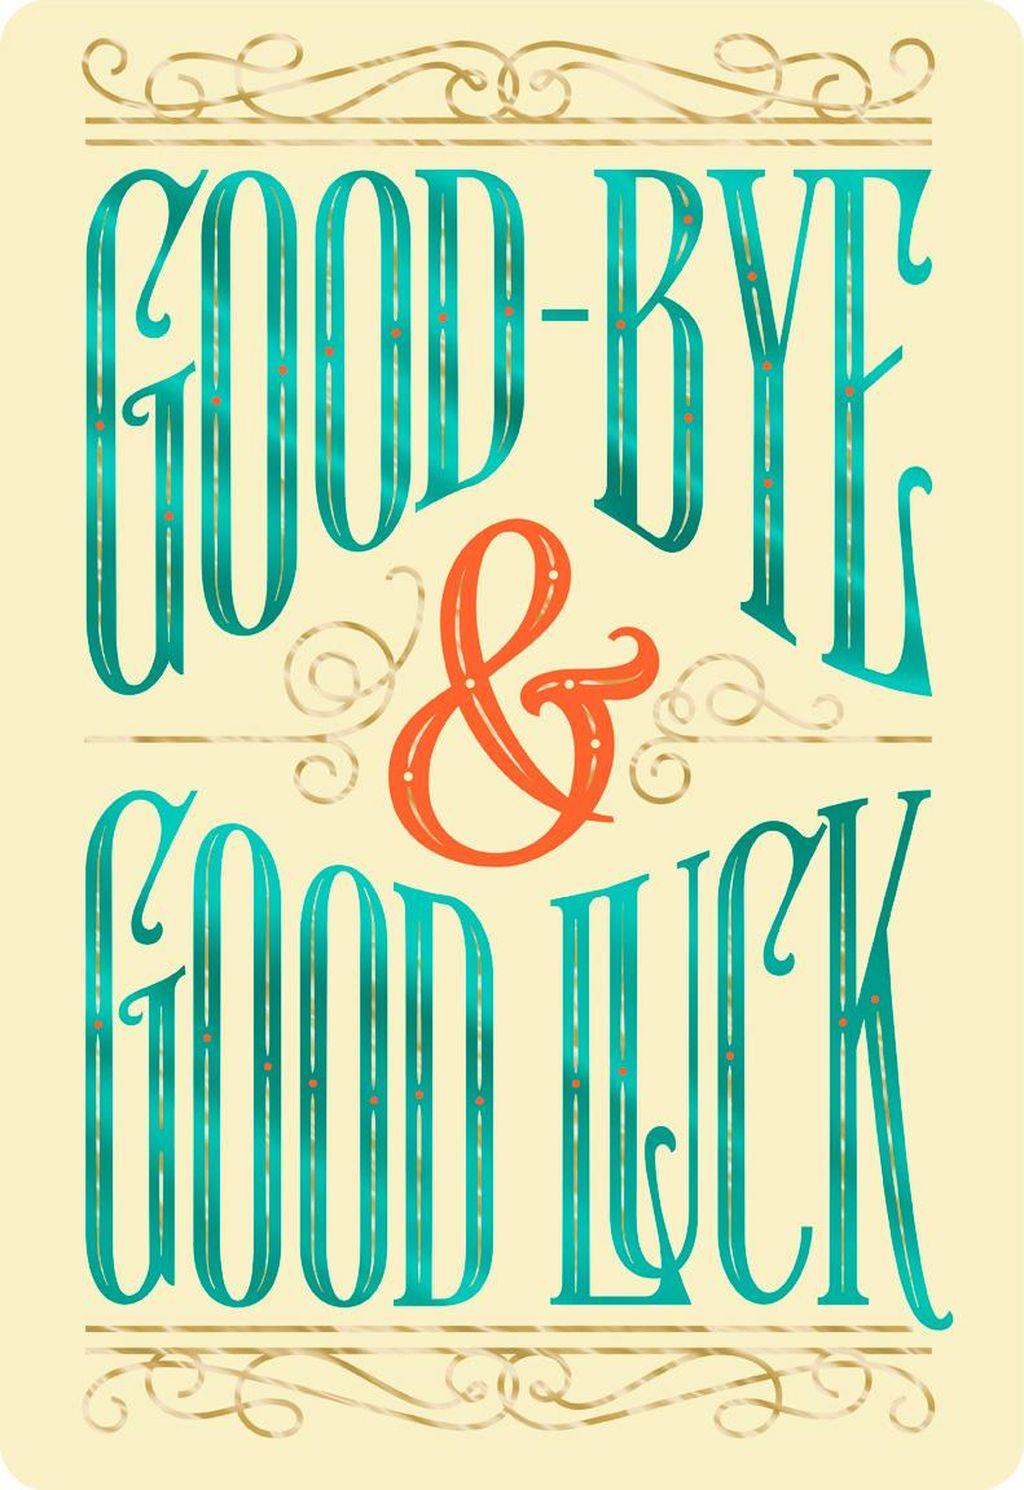 Goodbye Good Luck — BCMA.